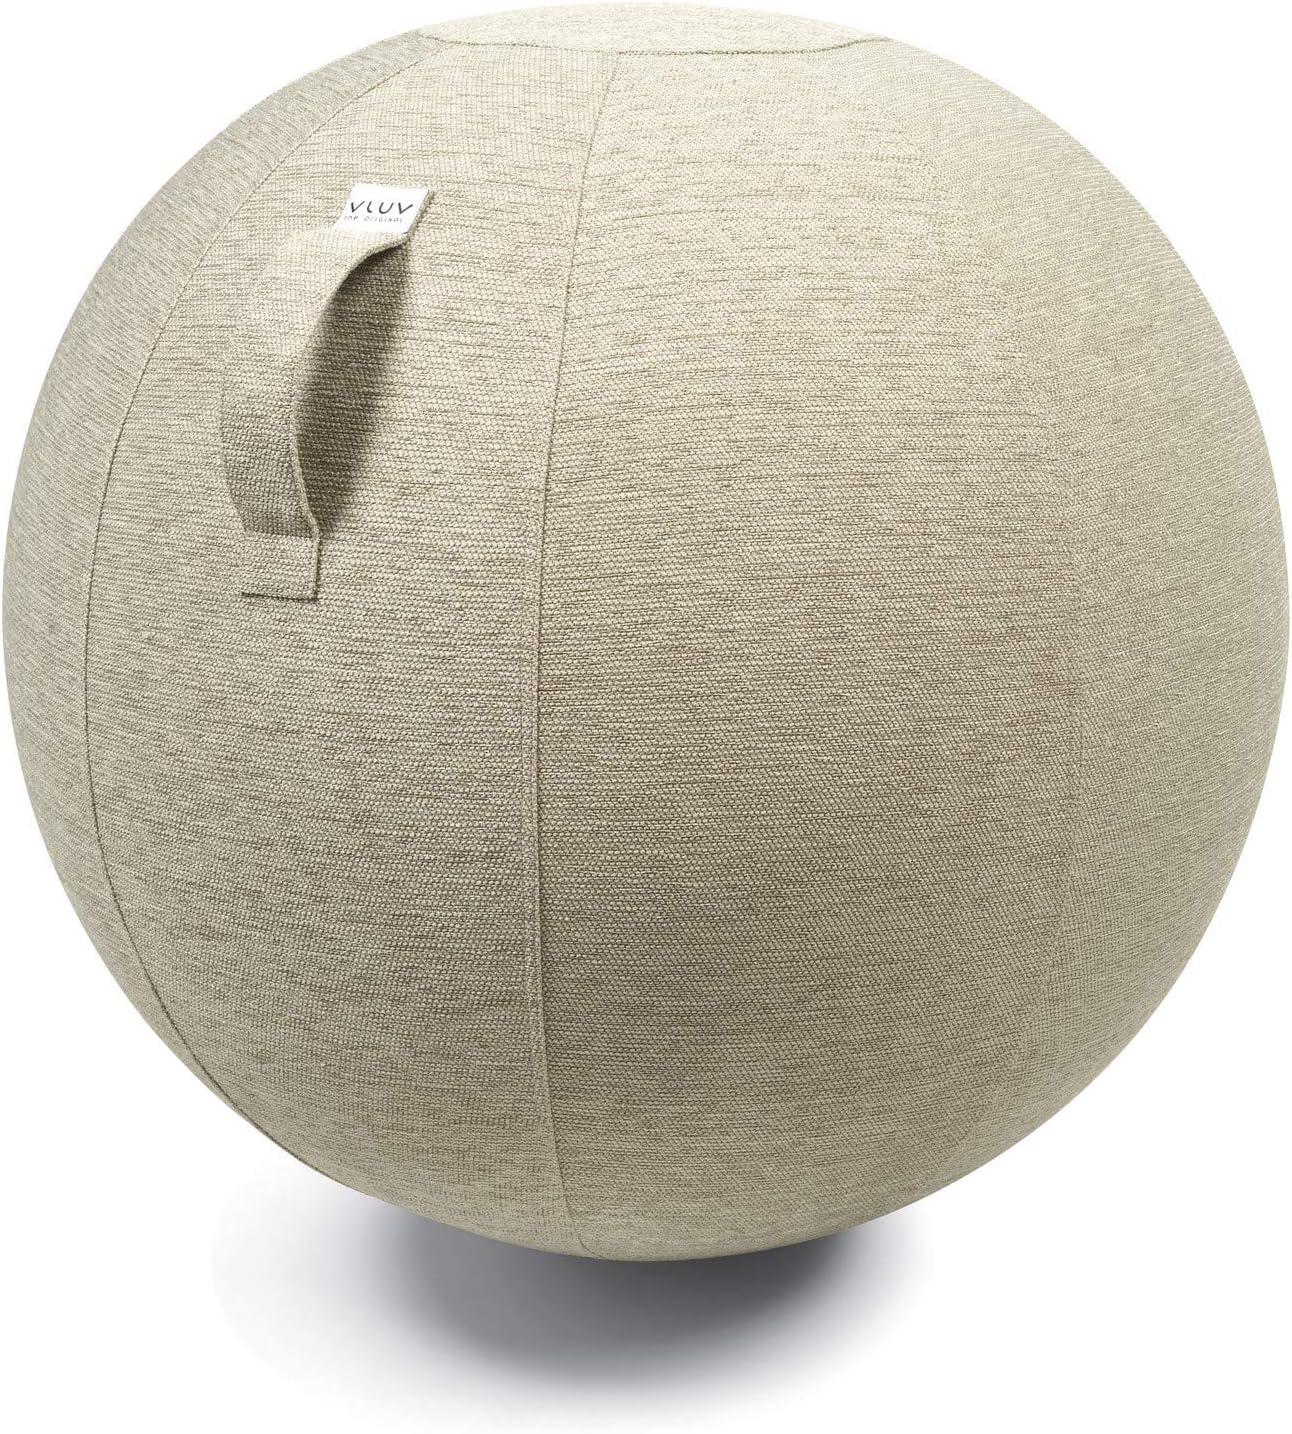 Hock VLUV STOV asiento ergonäomico, pelota con funda de tela de diseño Ø 75 cm para de trabajo, hogar - kiesel